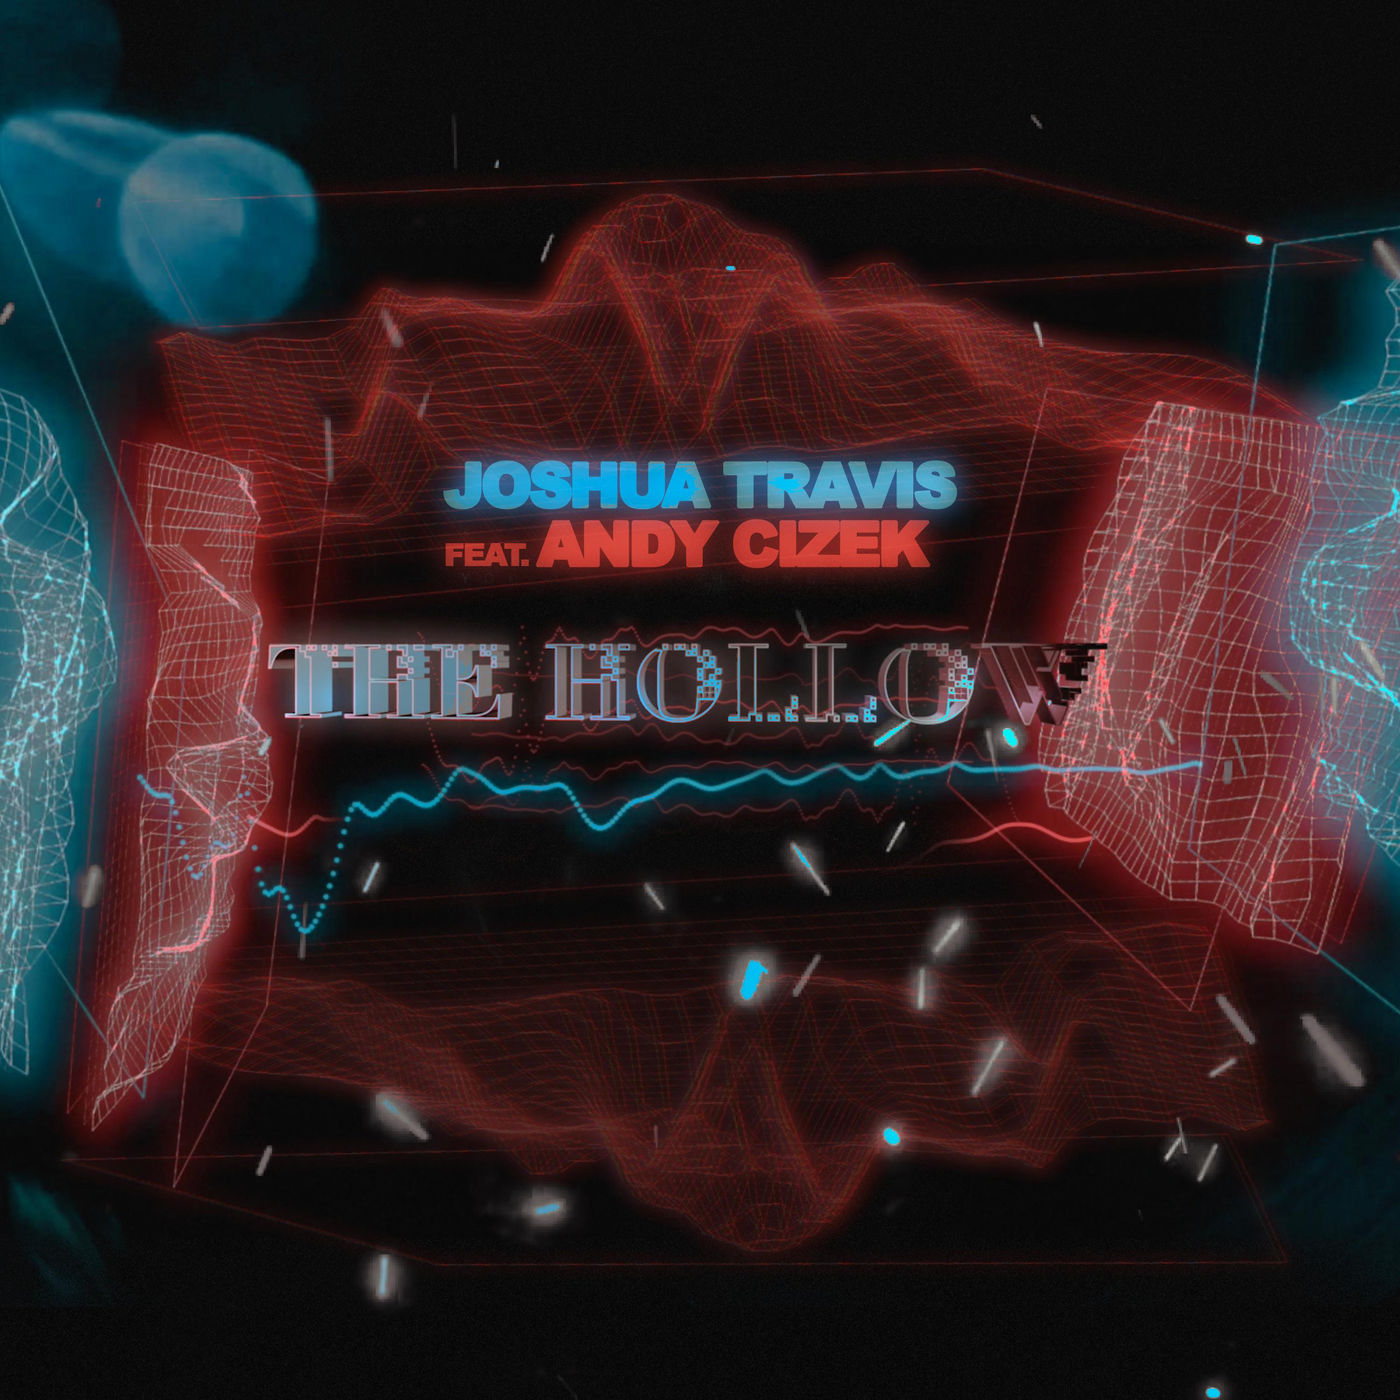 Joshua Travis - The Hollow [single] (2020)